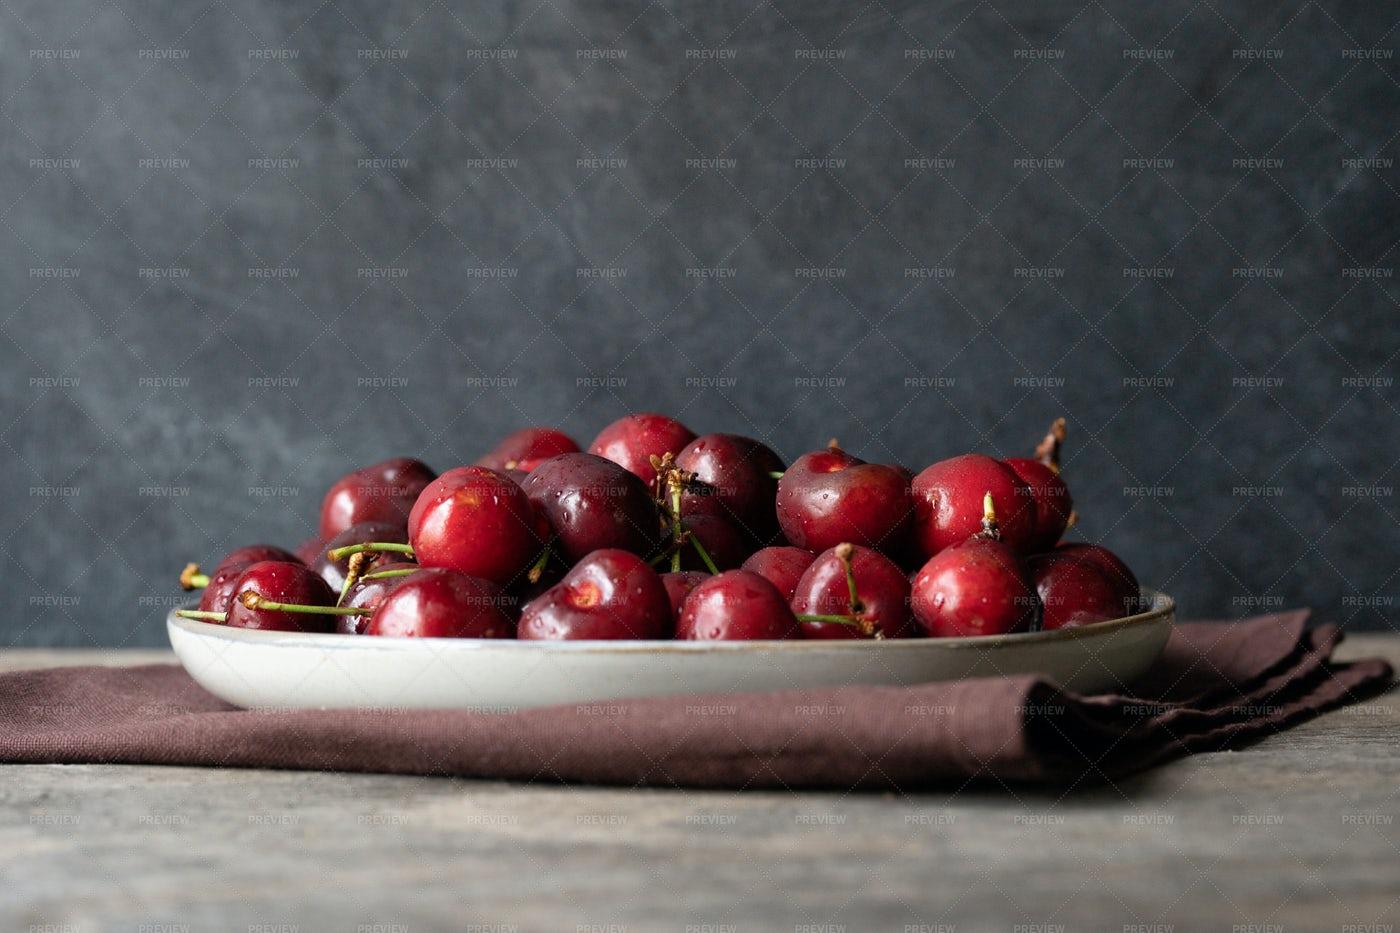 Fresh Cherries On Plate: Stock Photos